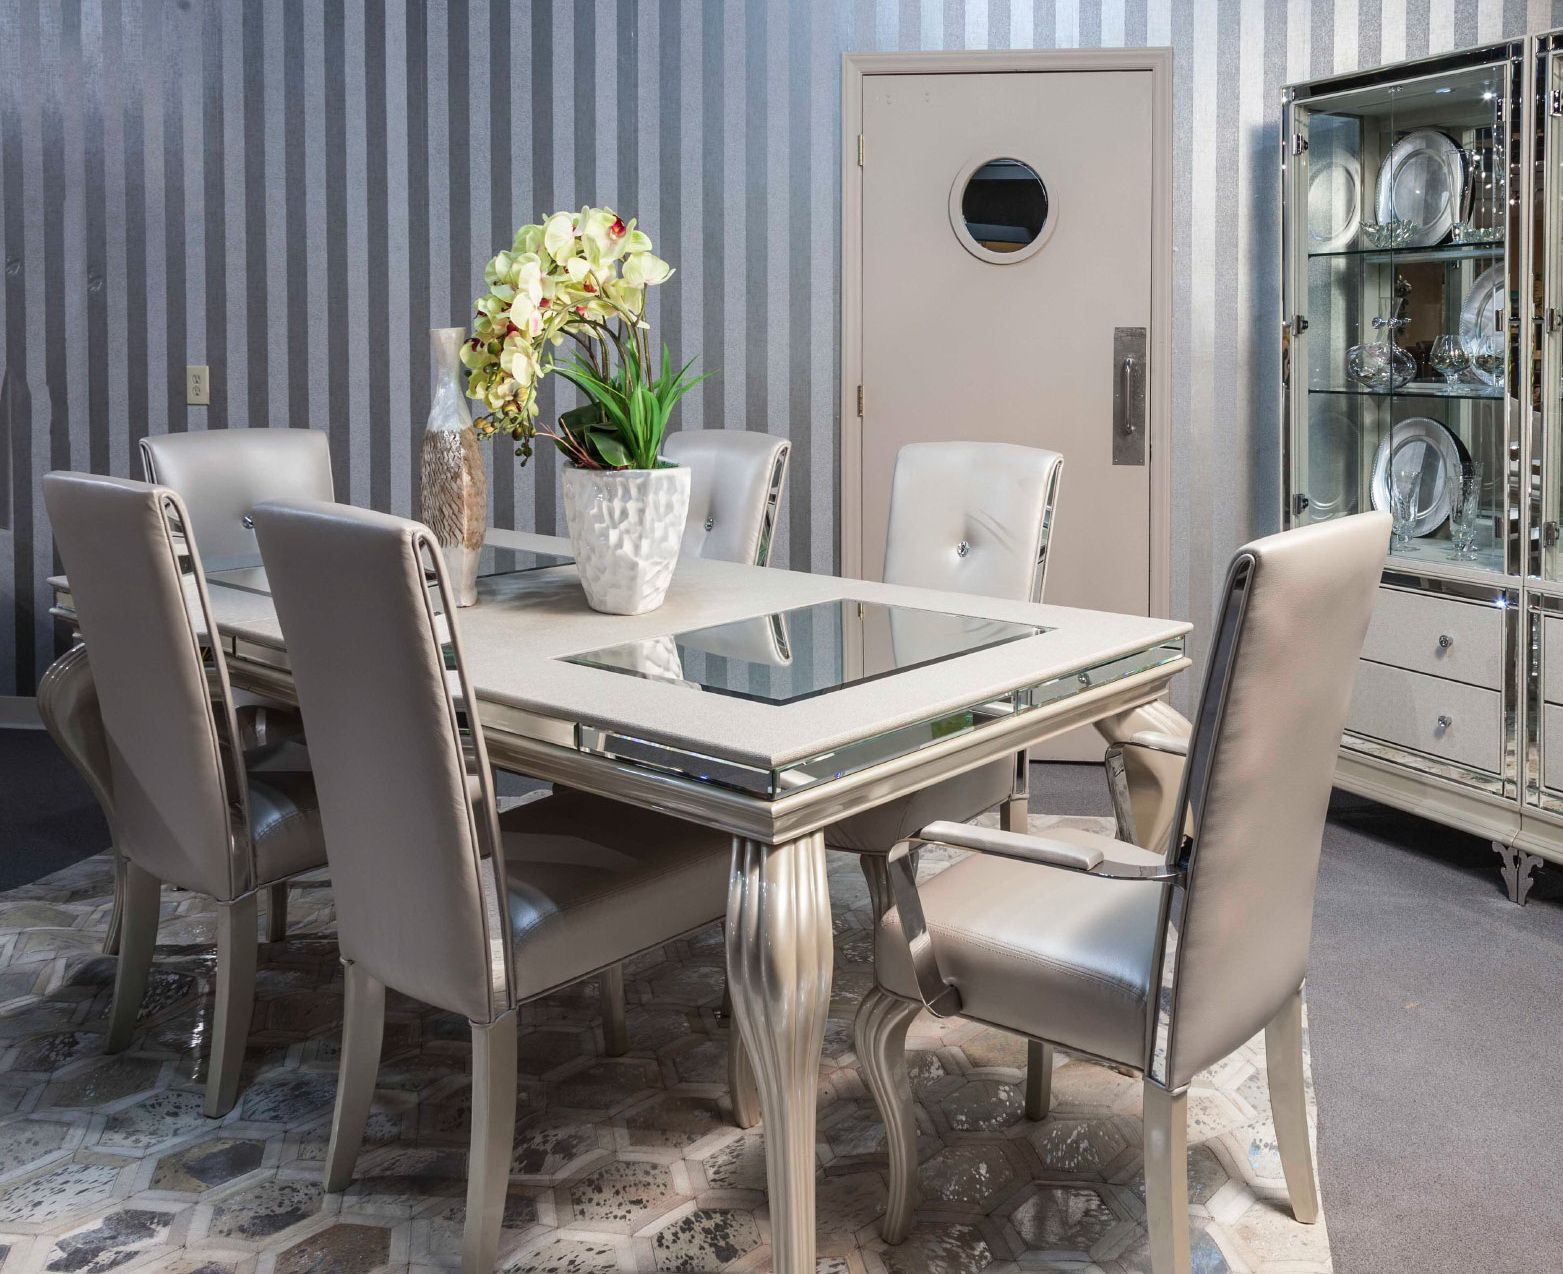 Best Hollywood Loft Frost 8 Pc Dining Set By Aico Görüntüler 400 x 300